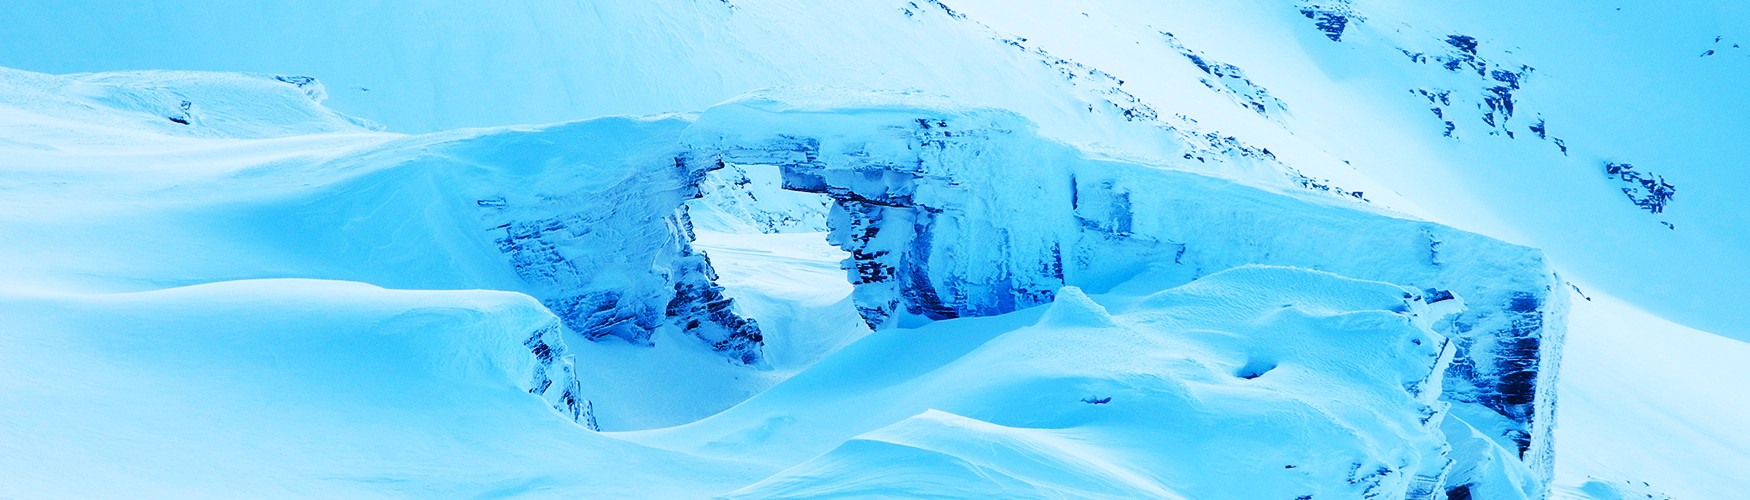 Skireise Norwegen